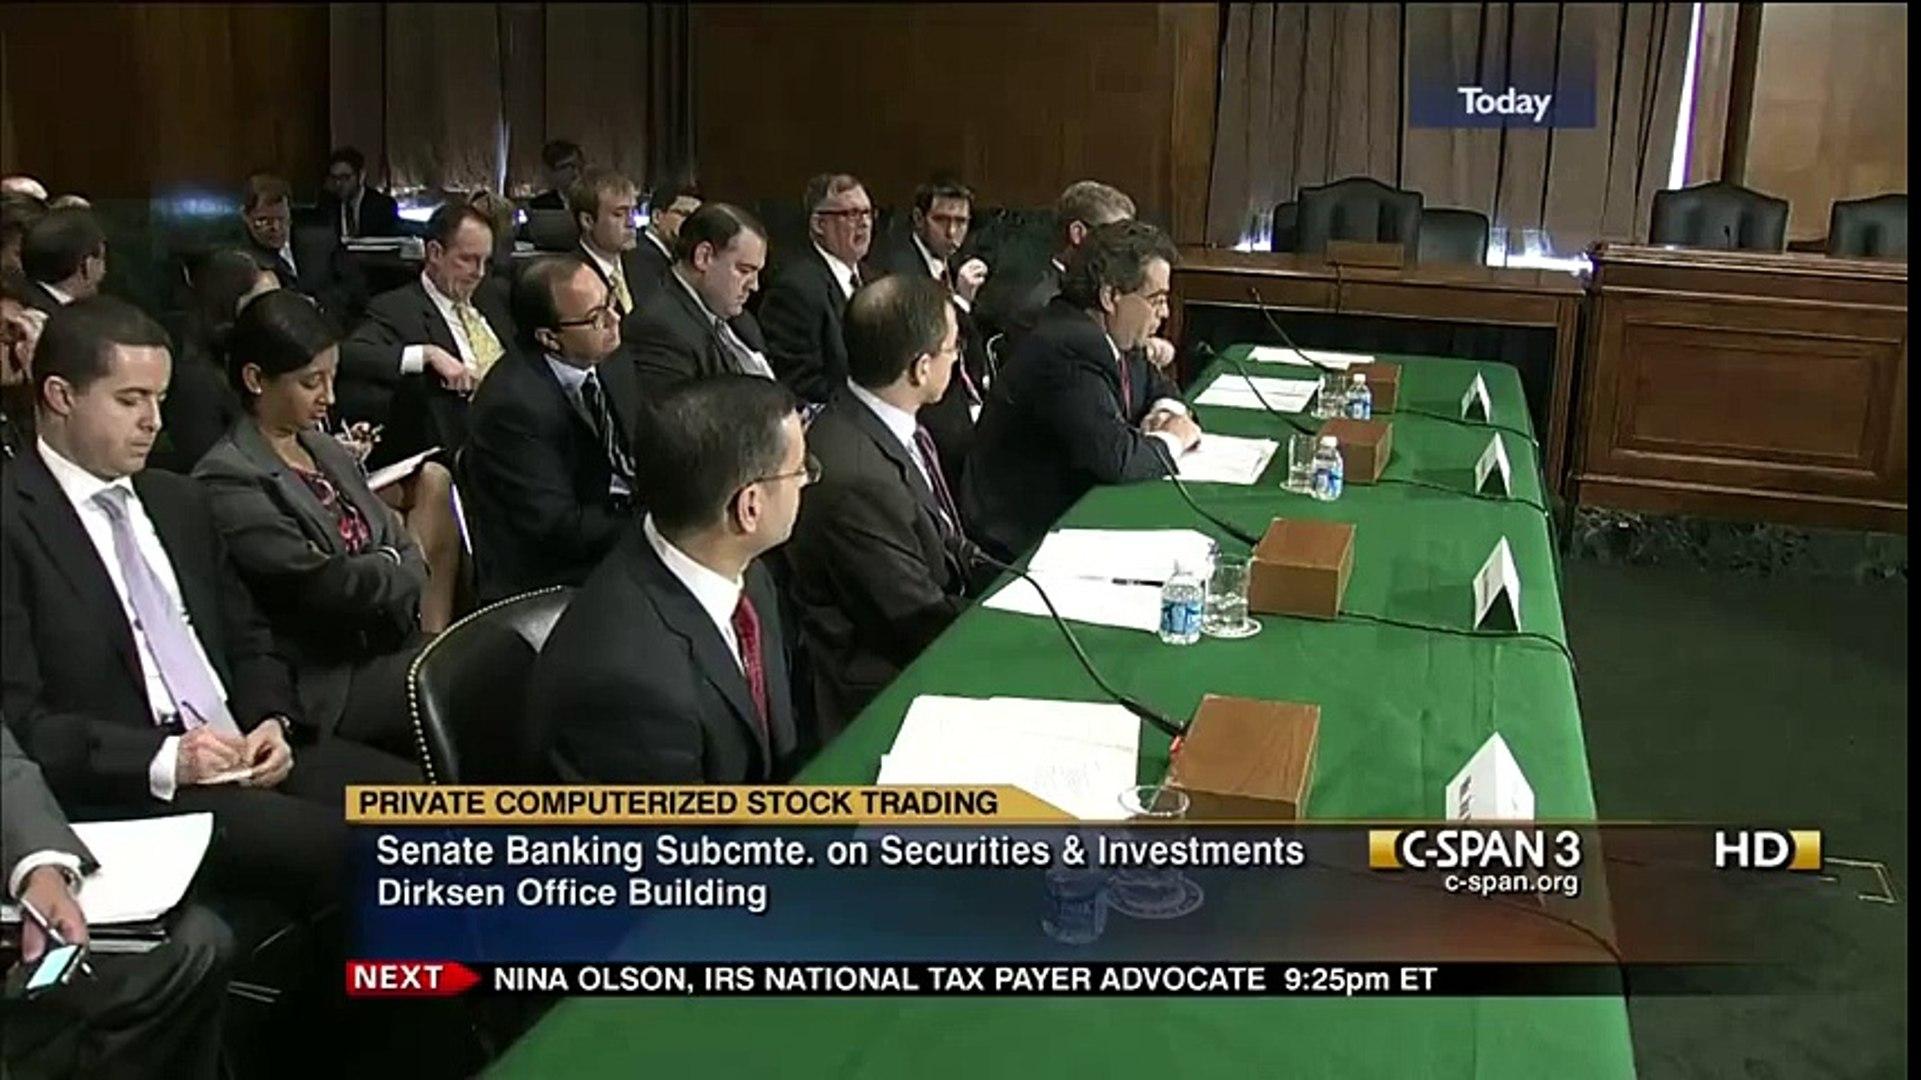 The Secret Stock Market: Private Computerized Stock Trading - Dark Pools (2012) part 2/2